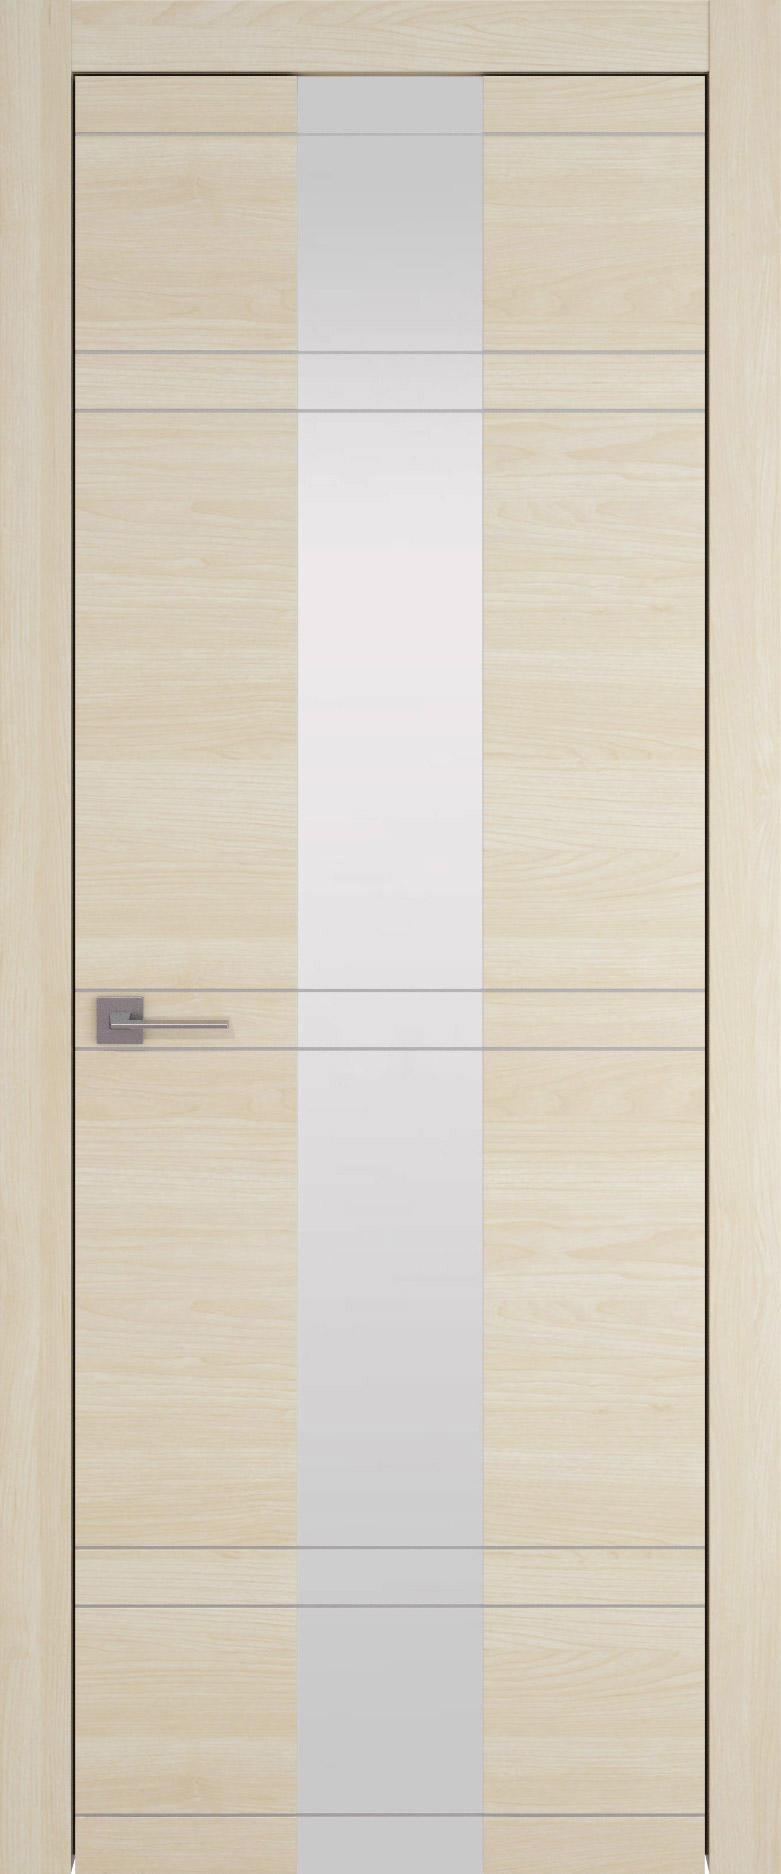 Tivoli Ж-4 цвет - Клен Со стеклом (ДО)